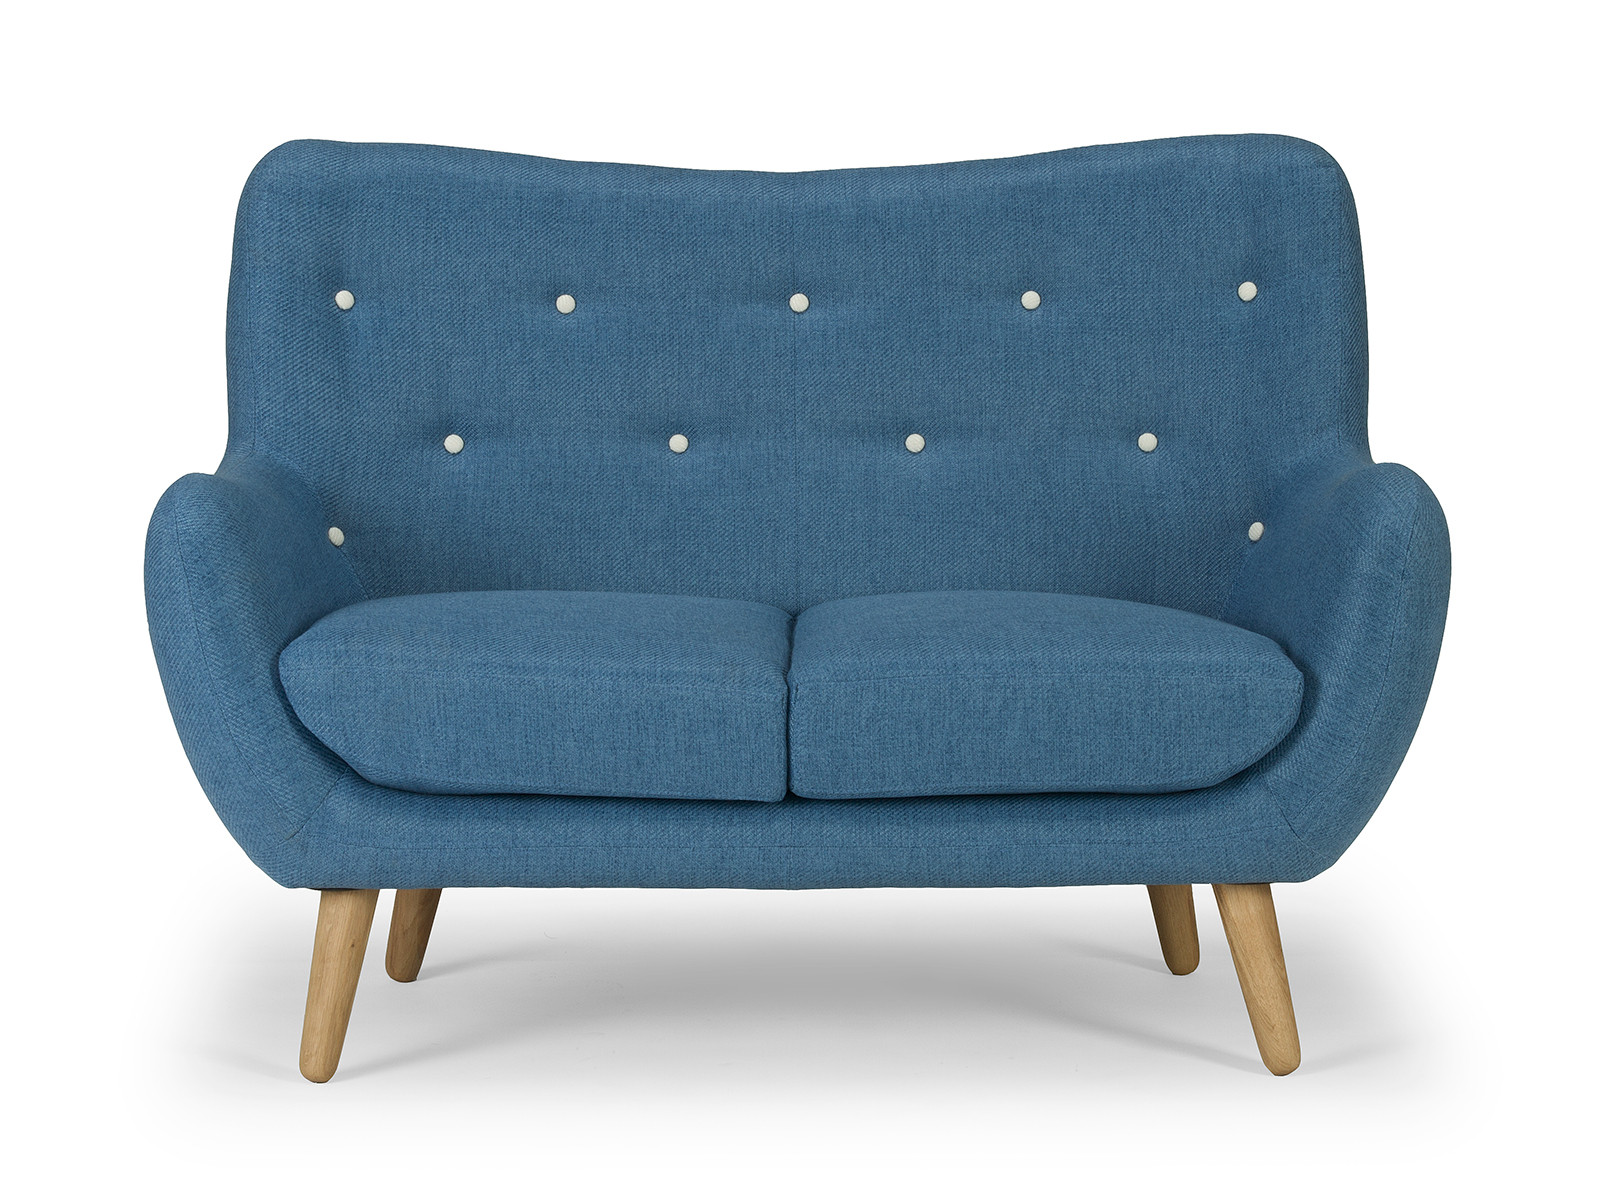 Retro Sofa Vintage Couch 2 Sitzer Im 60er Look Moebeldeal Com